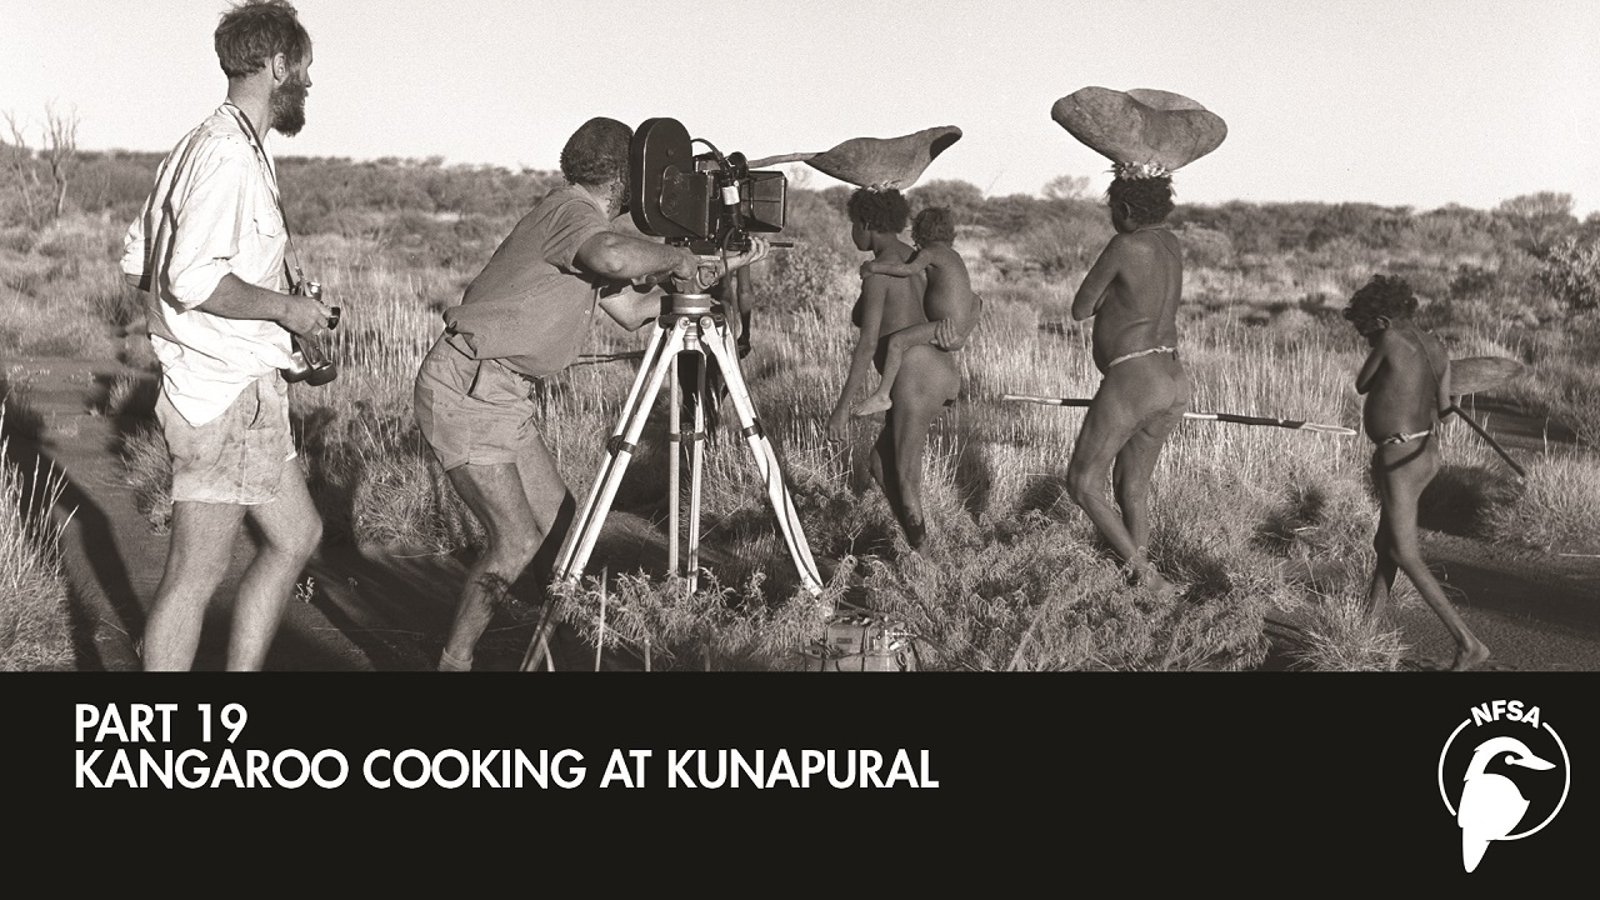 Kangaroo Cooking at Kunapural